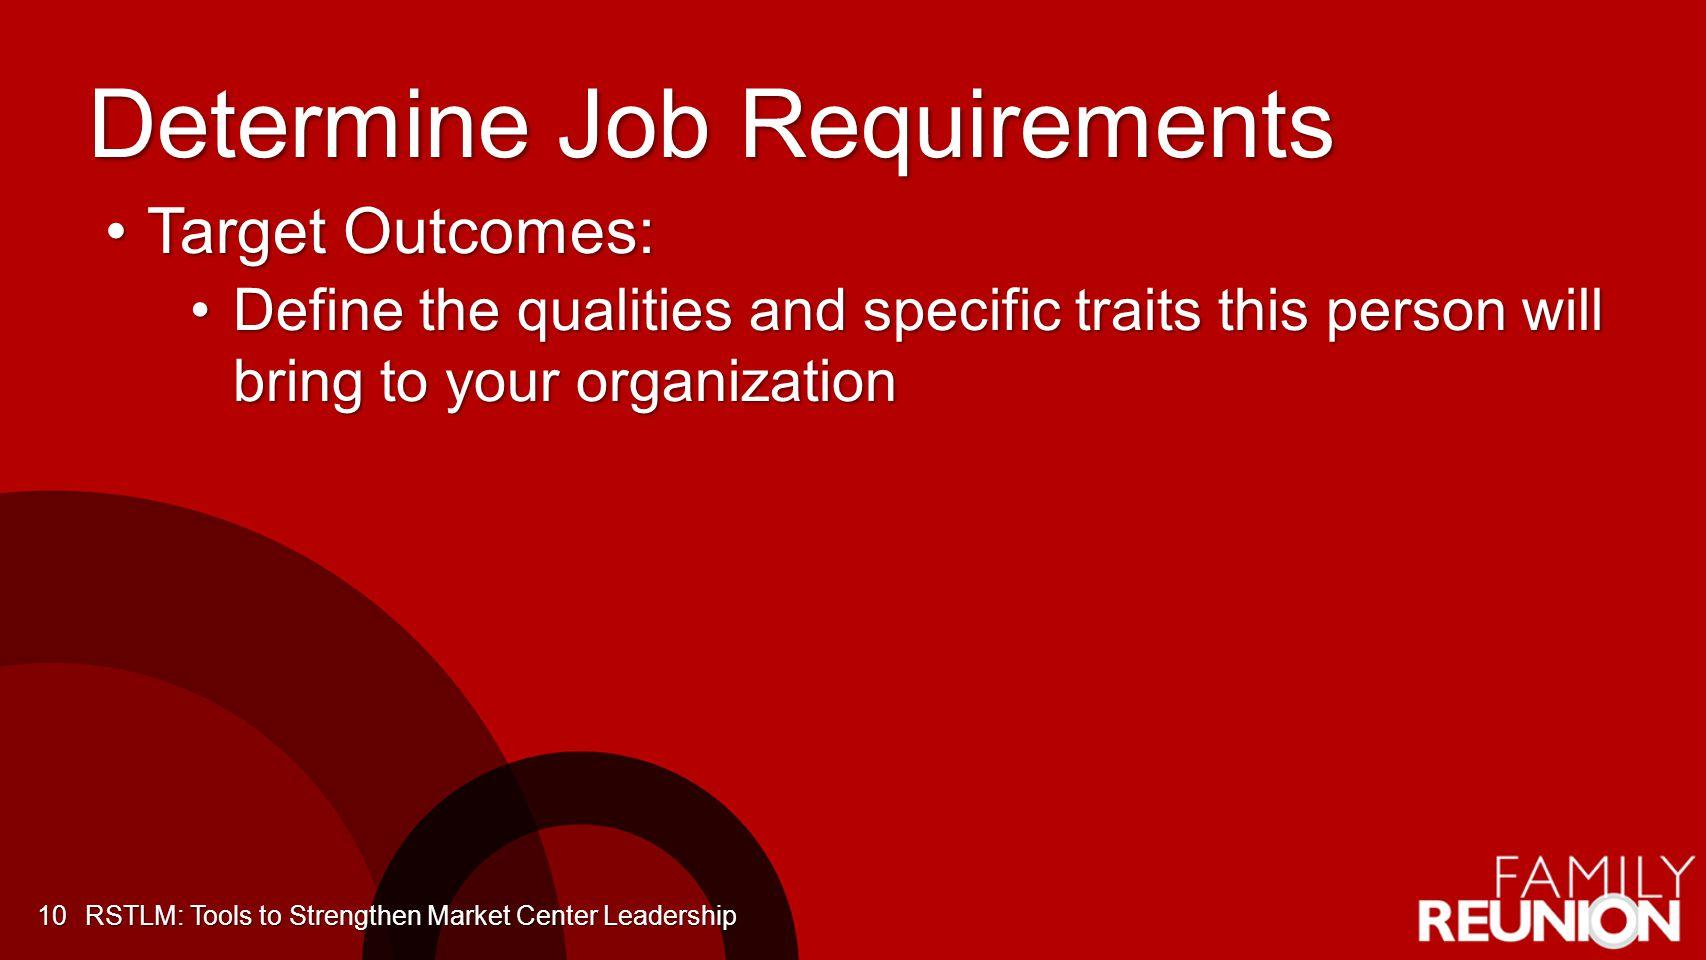 Determine Job Requirements